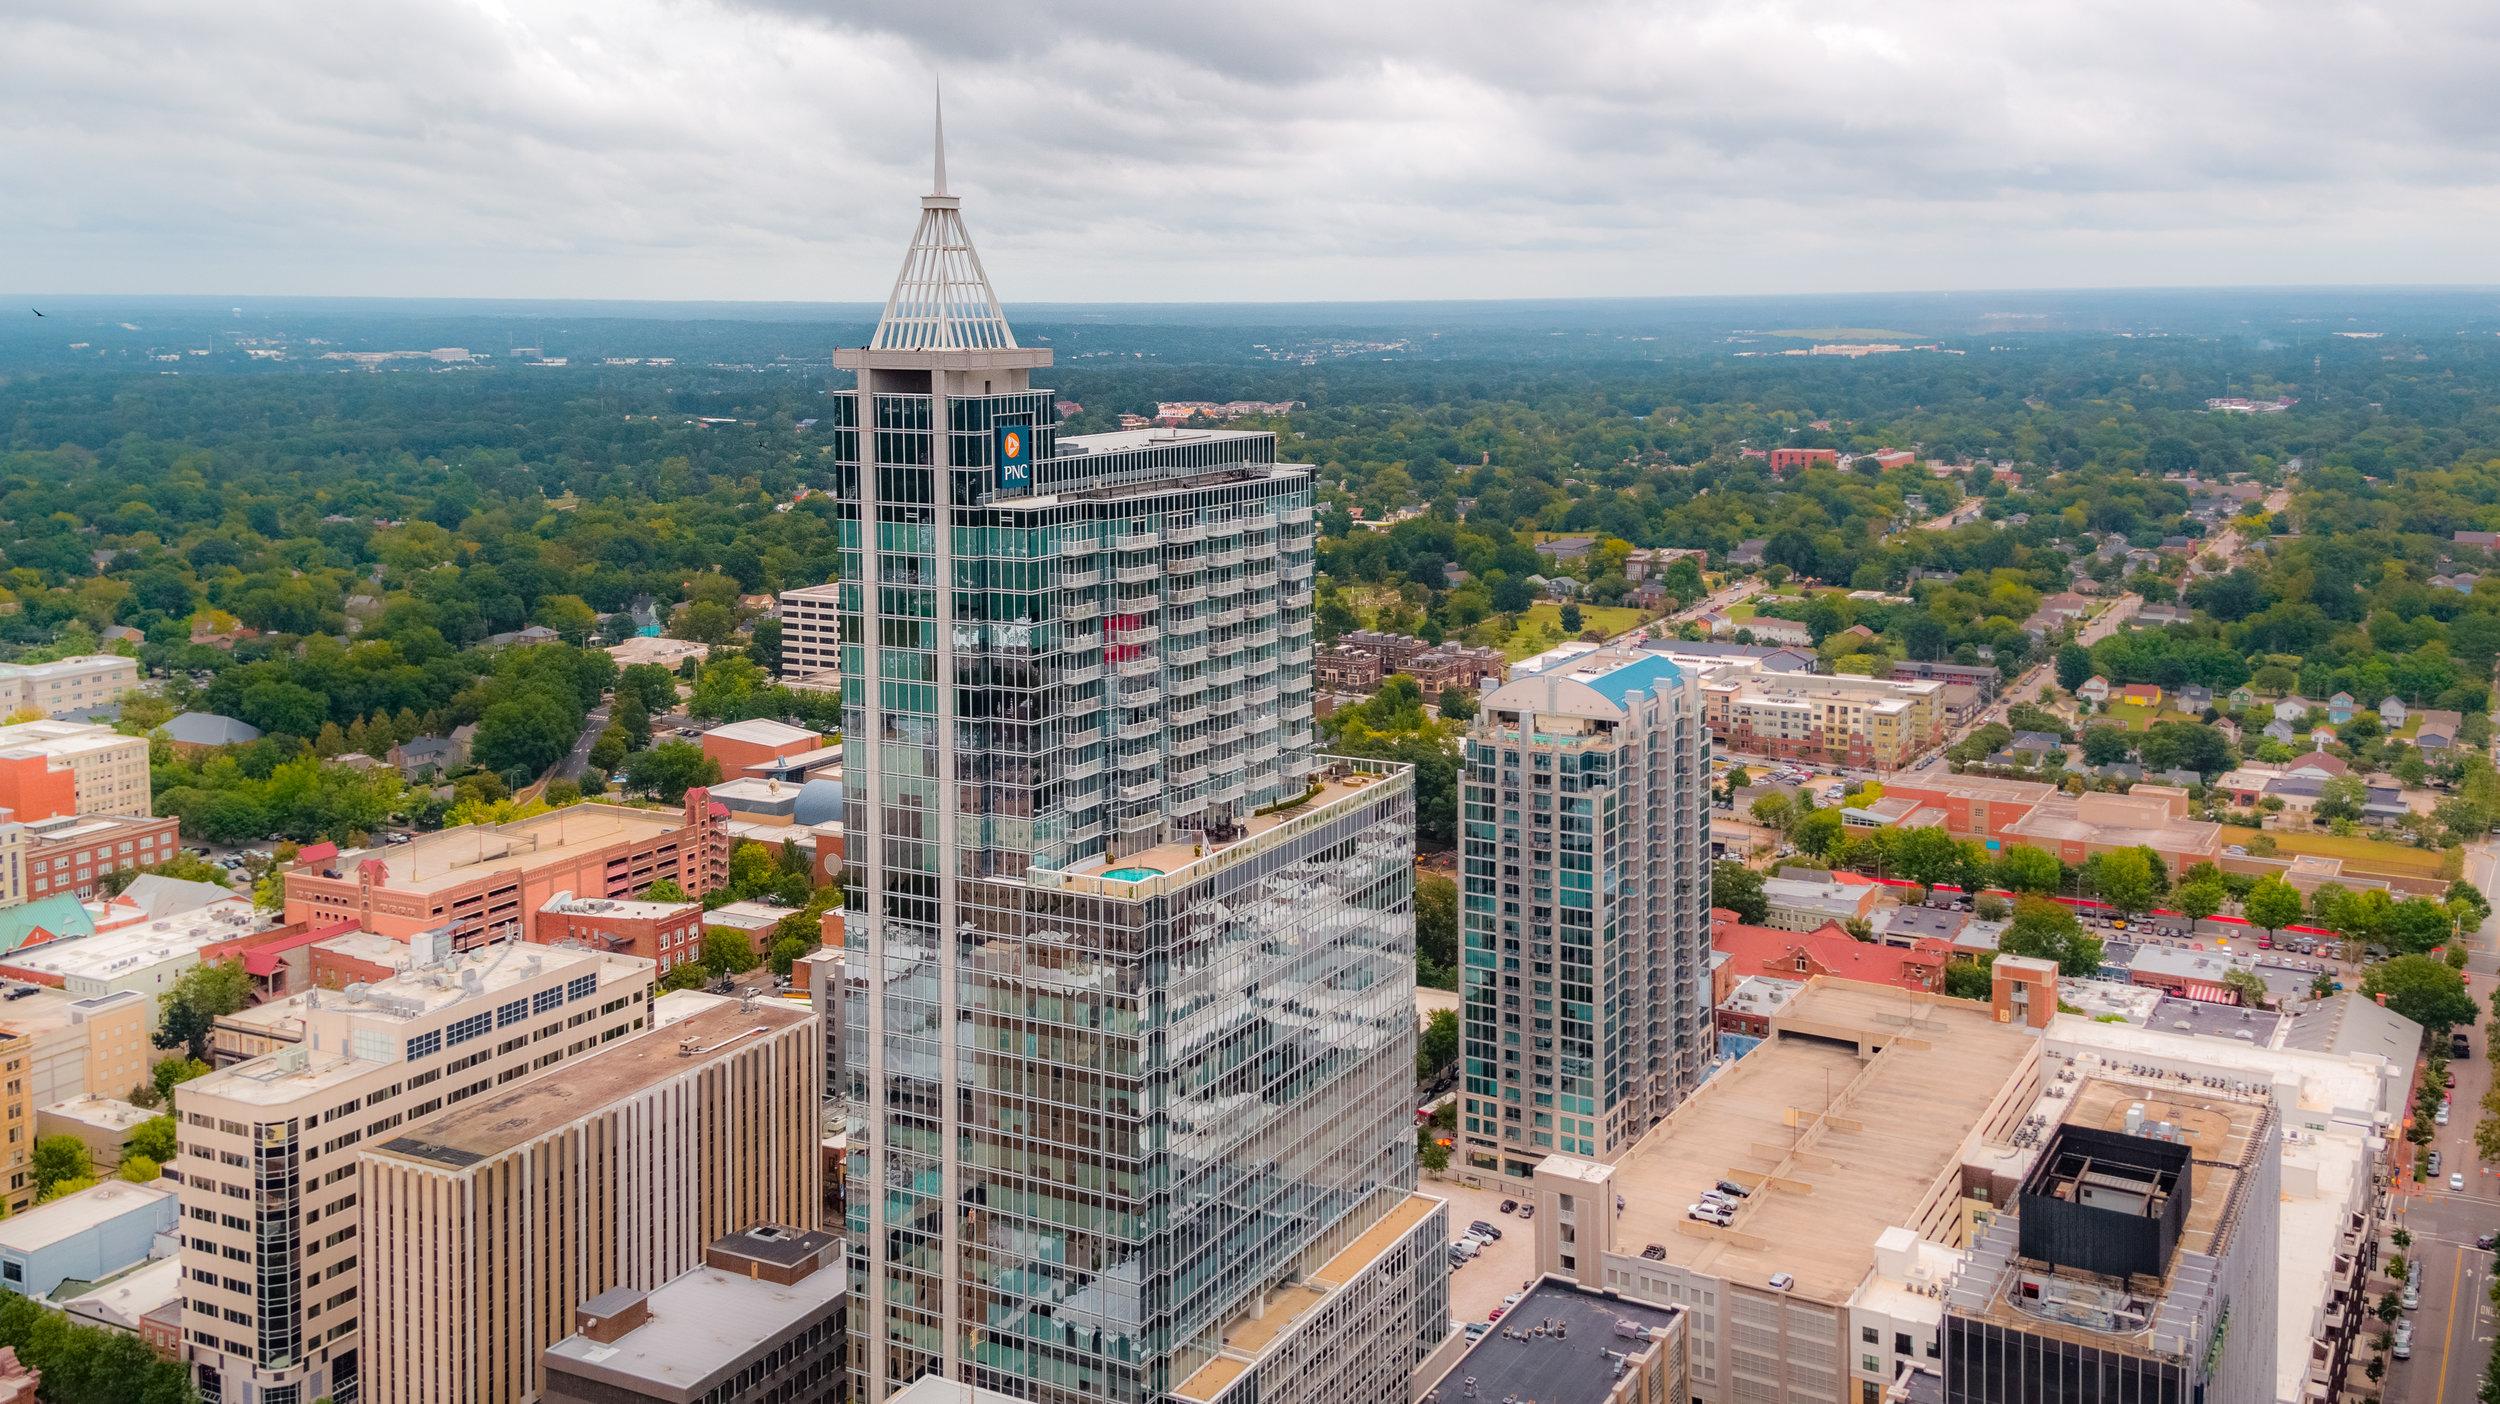 real-estate-photography-drone-photographer-drone-greensboro-nc-triad-217.jpg